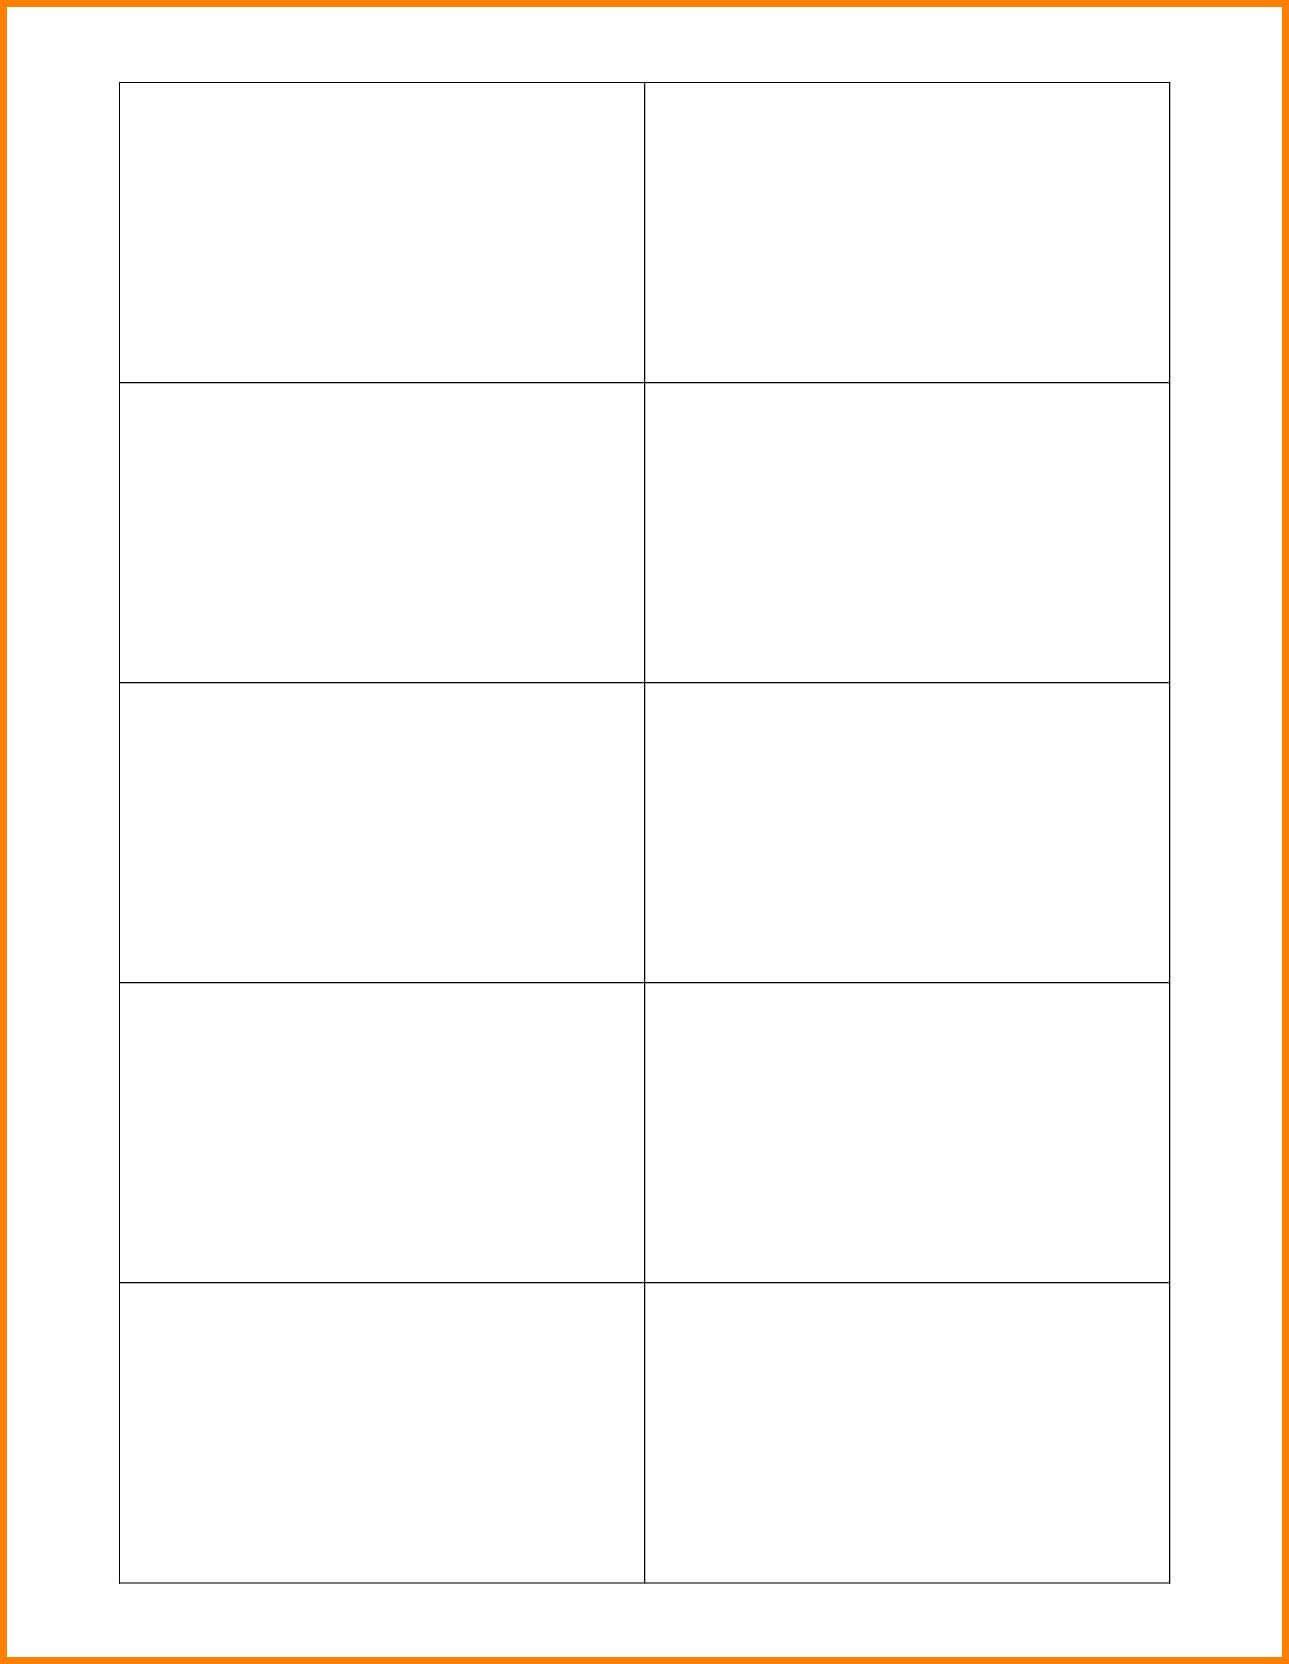 001 Blank Business Card Template Free Microsoft Word throughout Business Card Template Word 2010